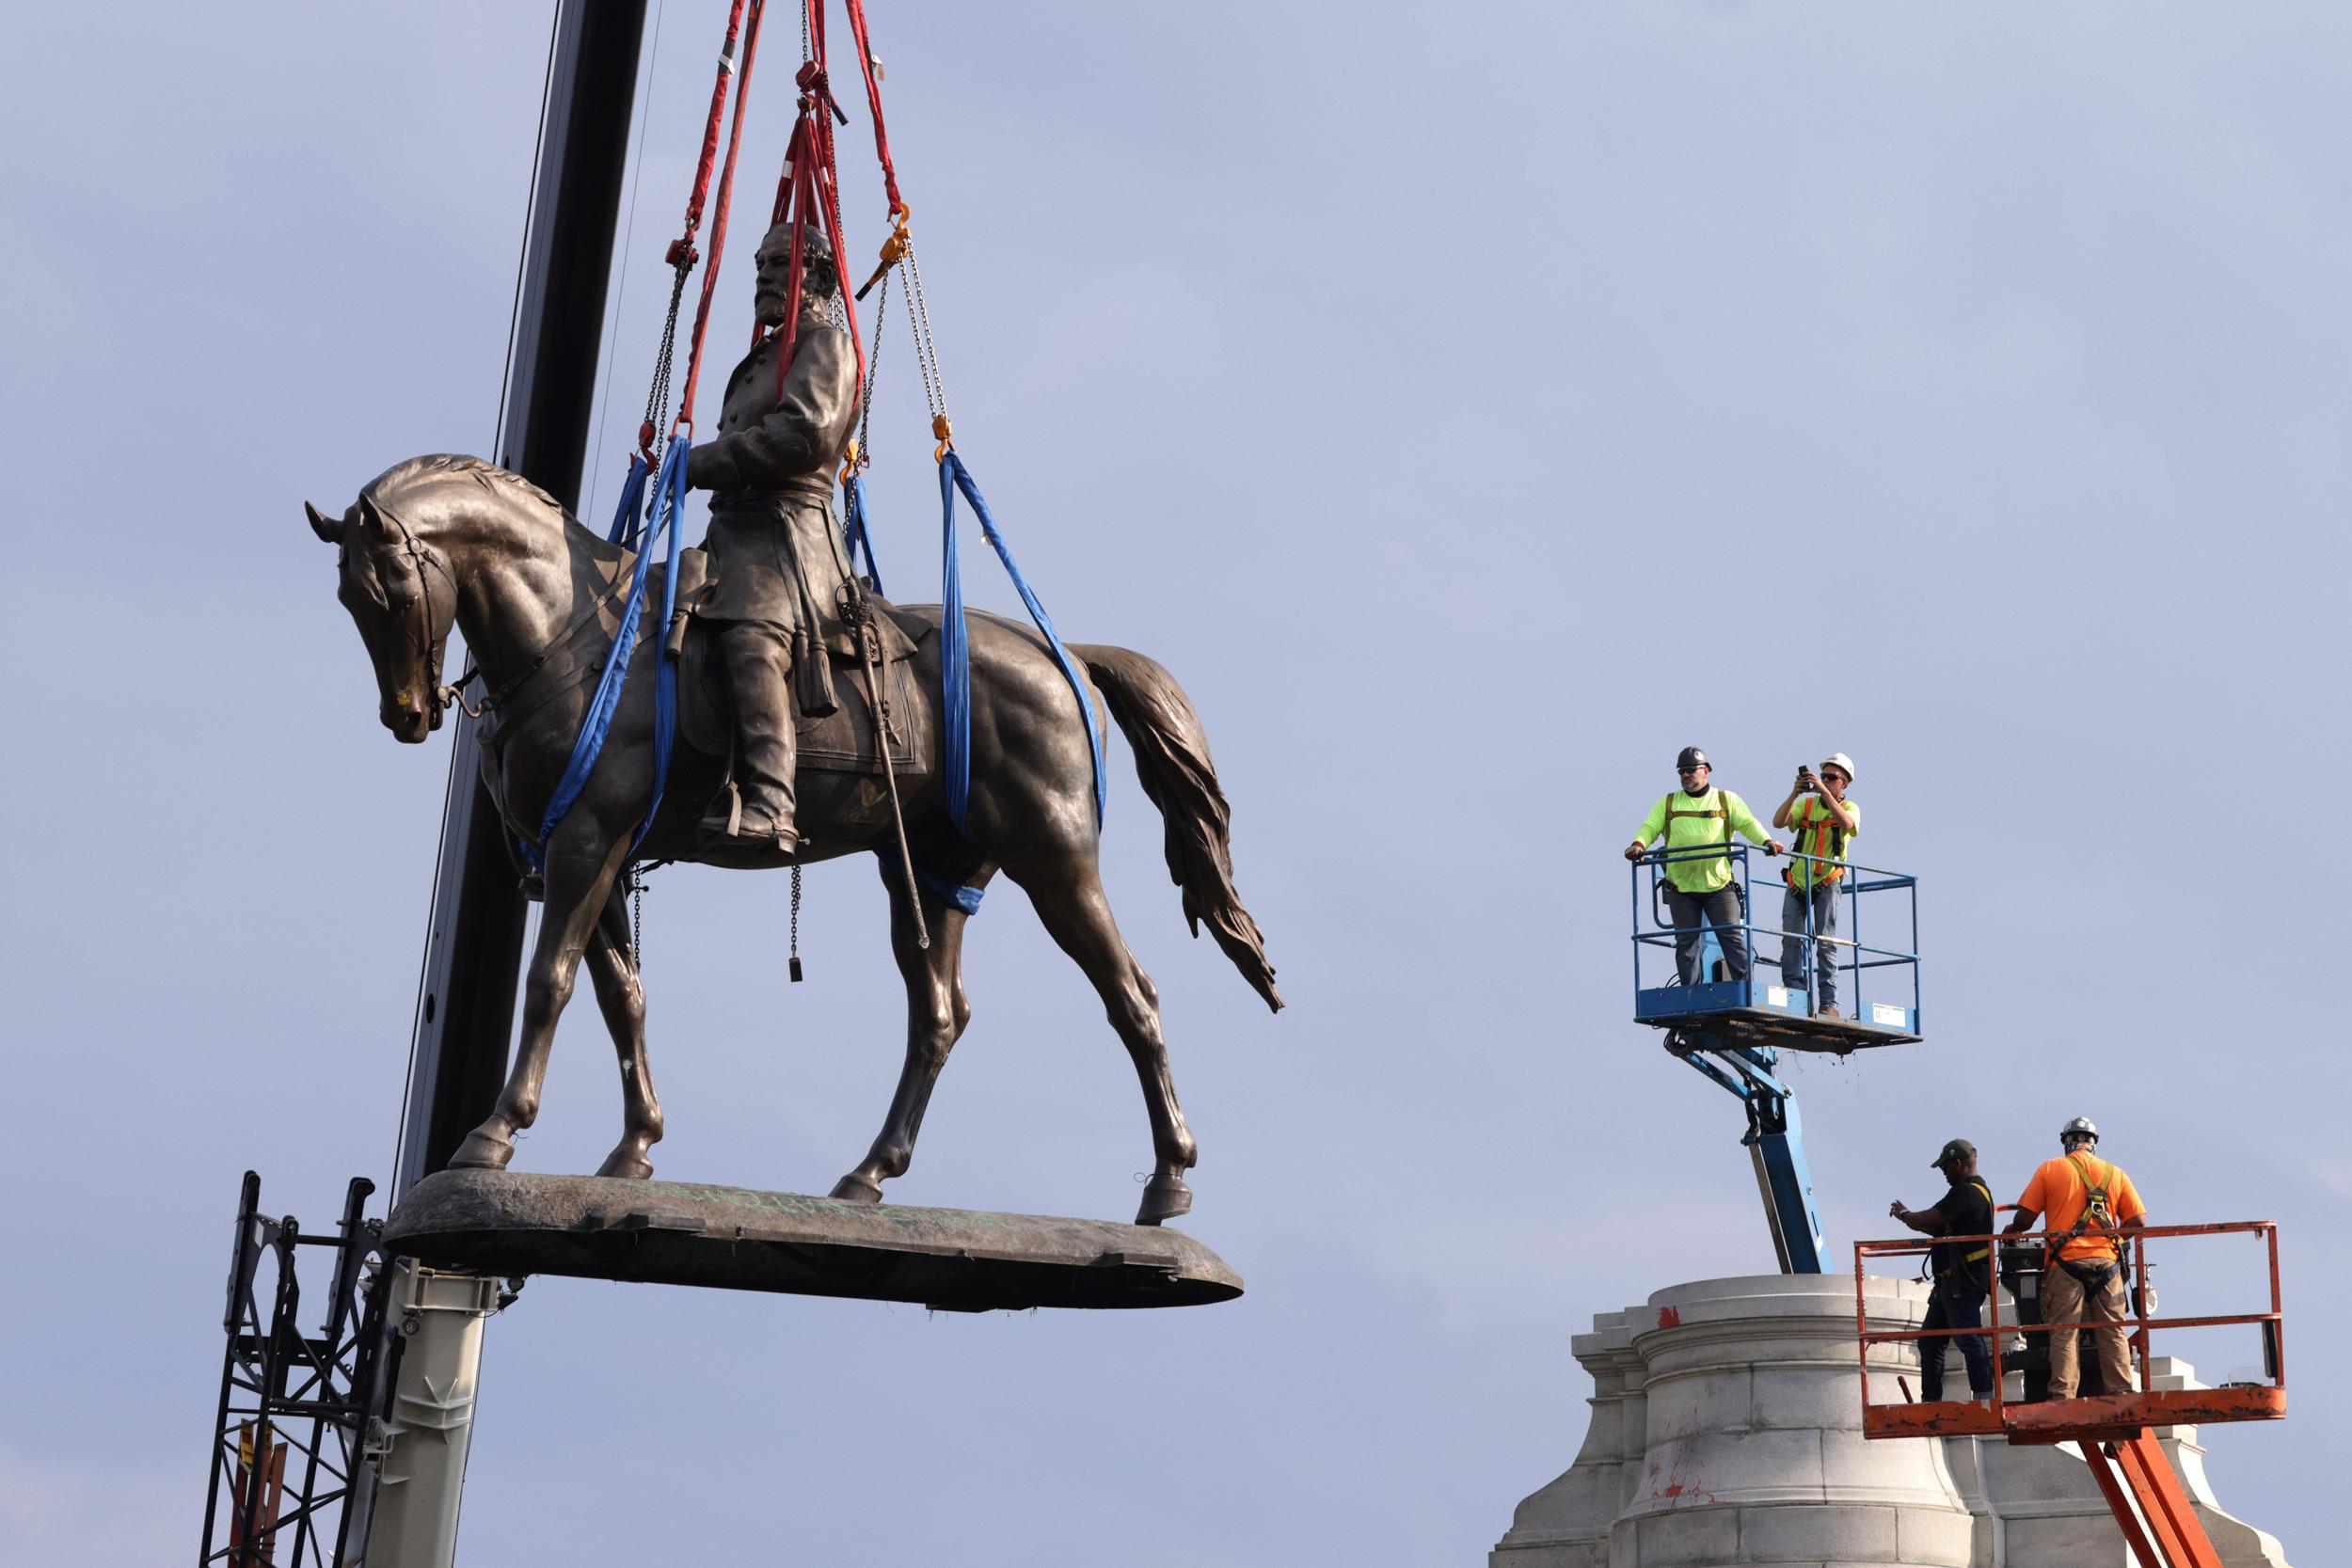 Robert E. Lee statue taken down, cut into pieces